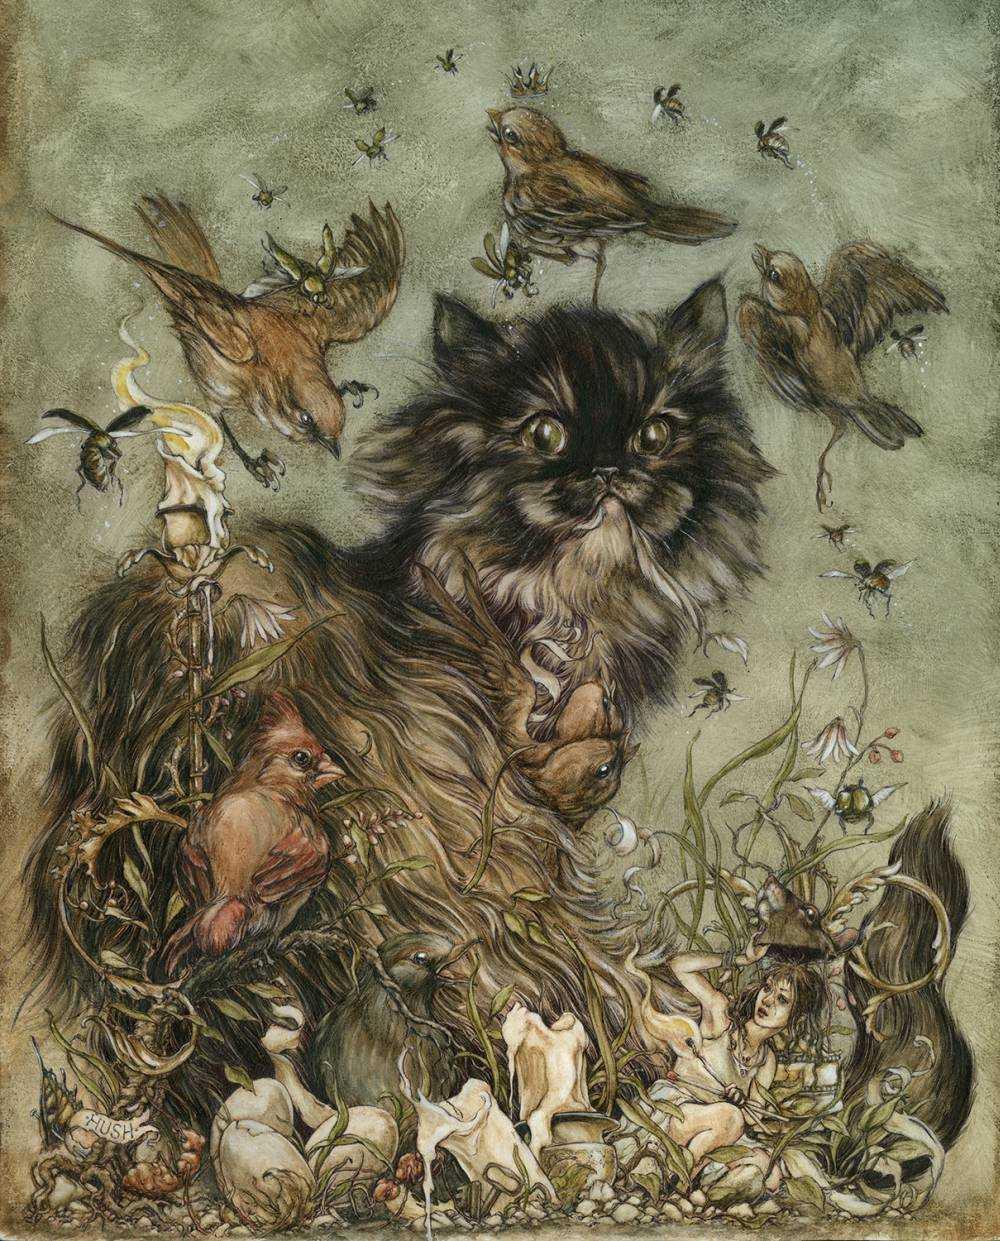 Jeremy hush - Illustrations-themischeiviousandthewayward